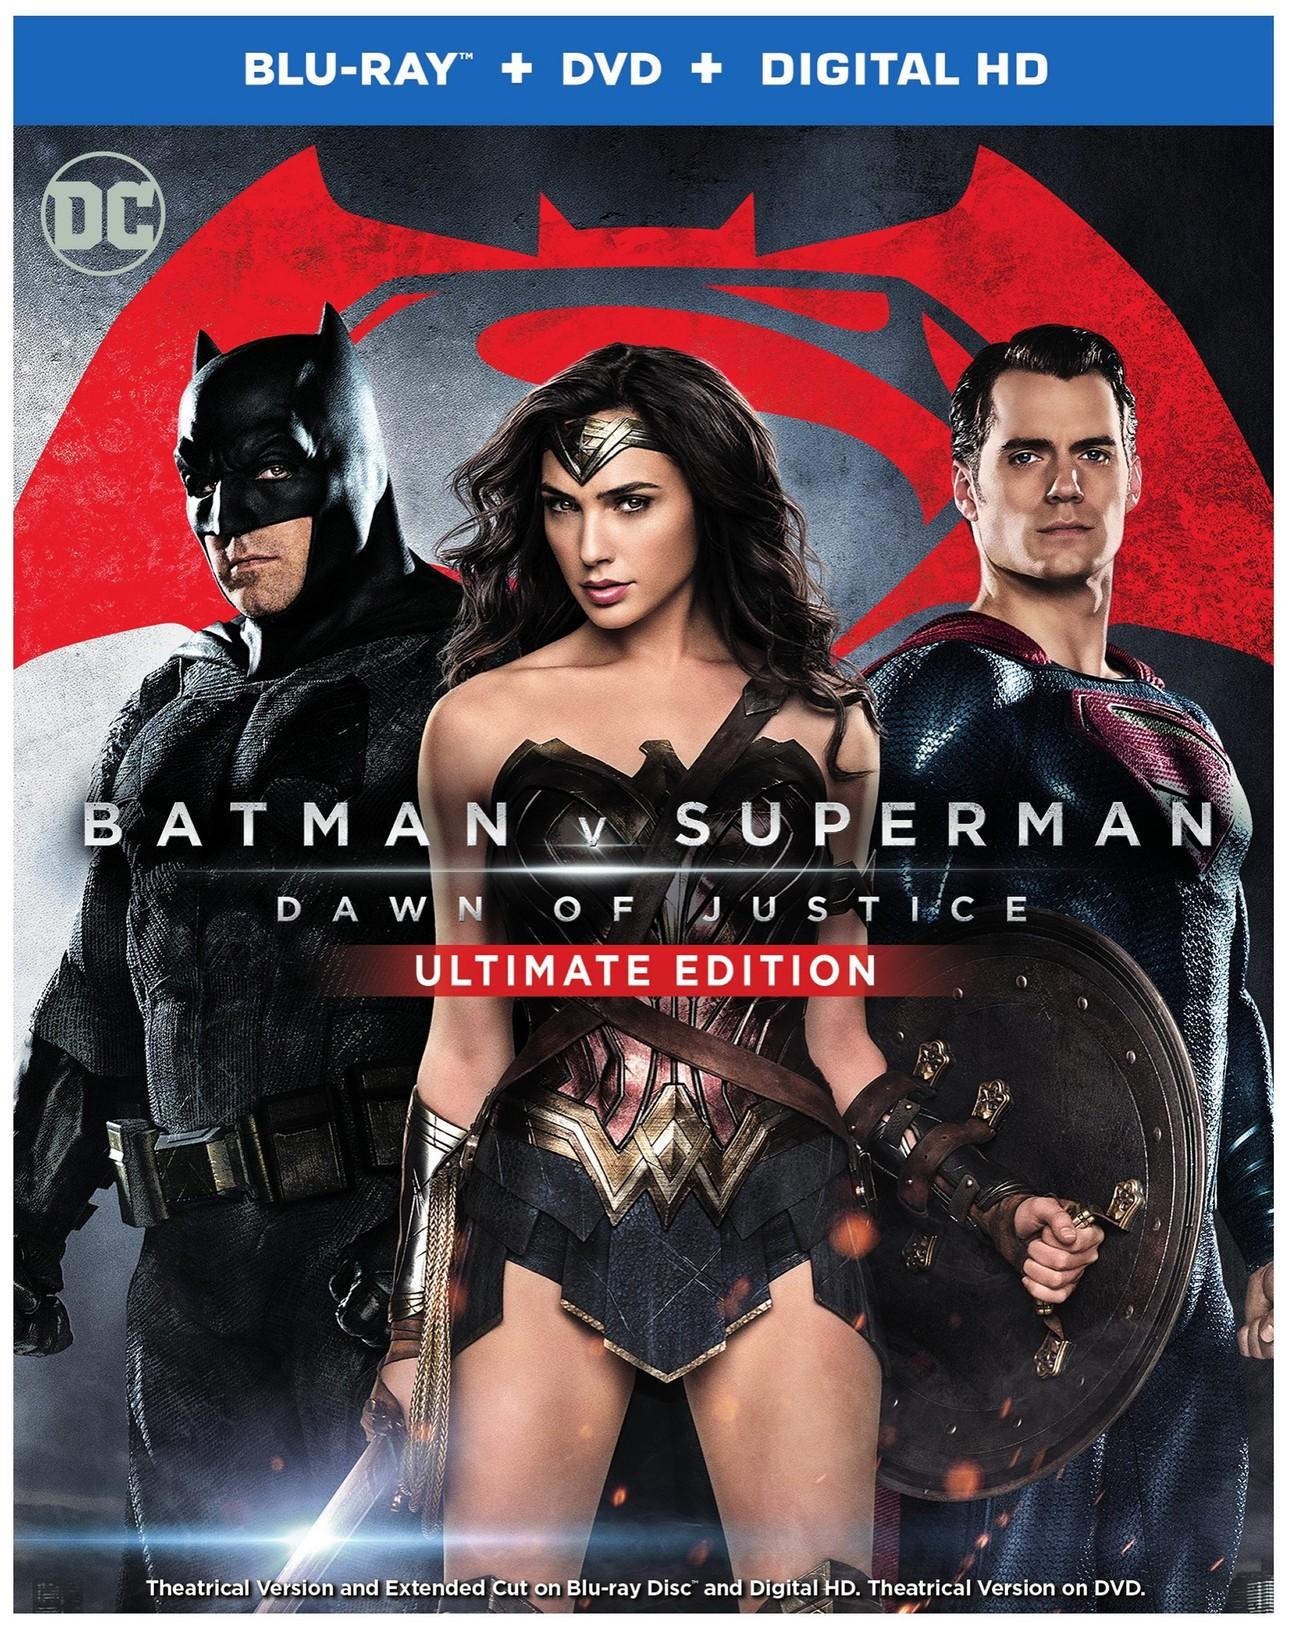 batman-v-superman-ultimate-edition-blu-ray-cover_0.jpeg